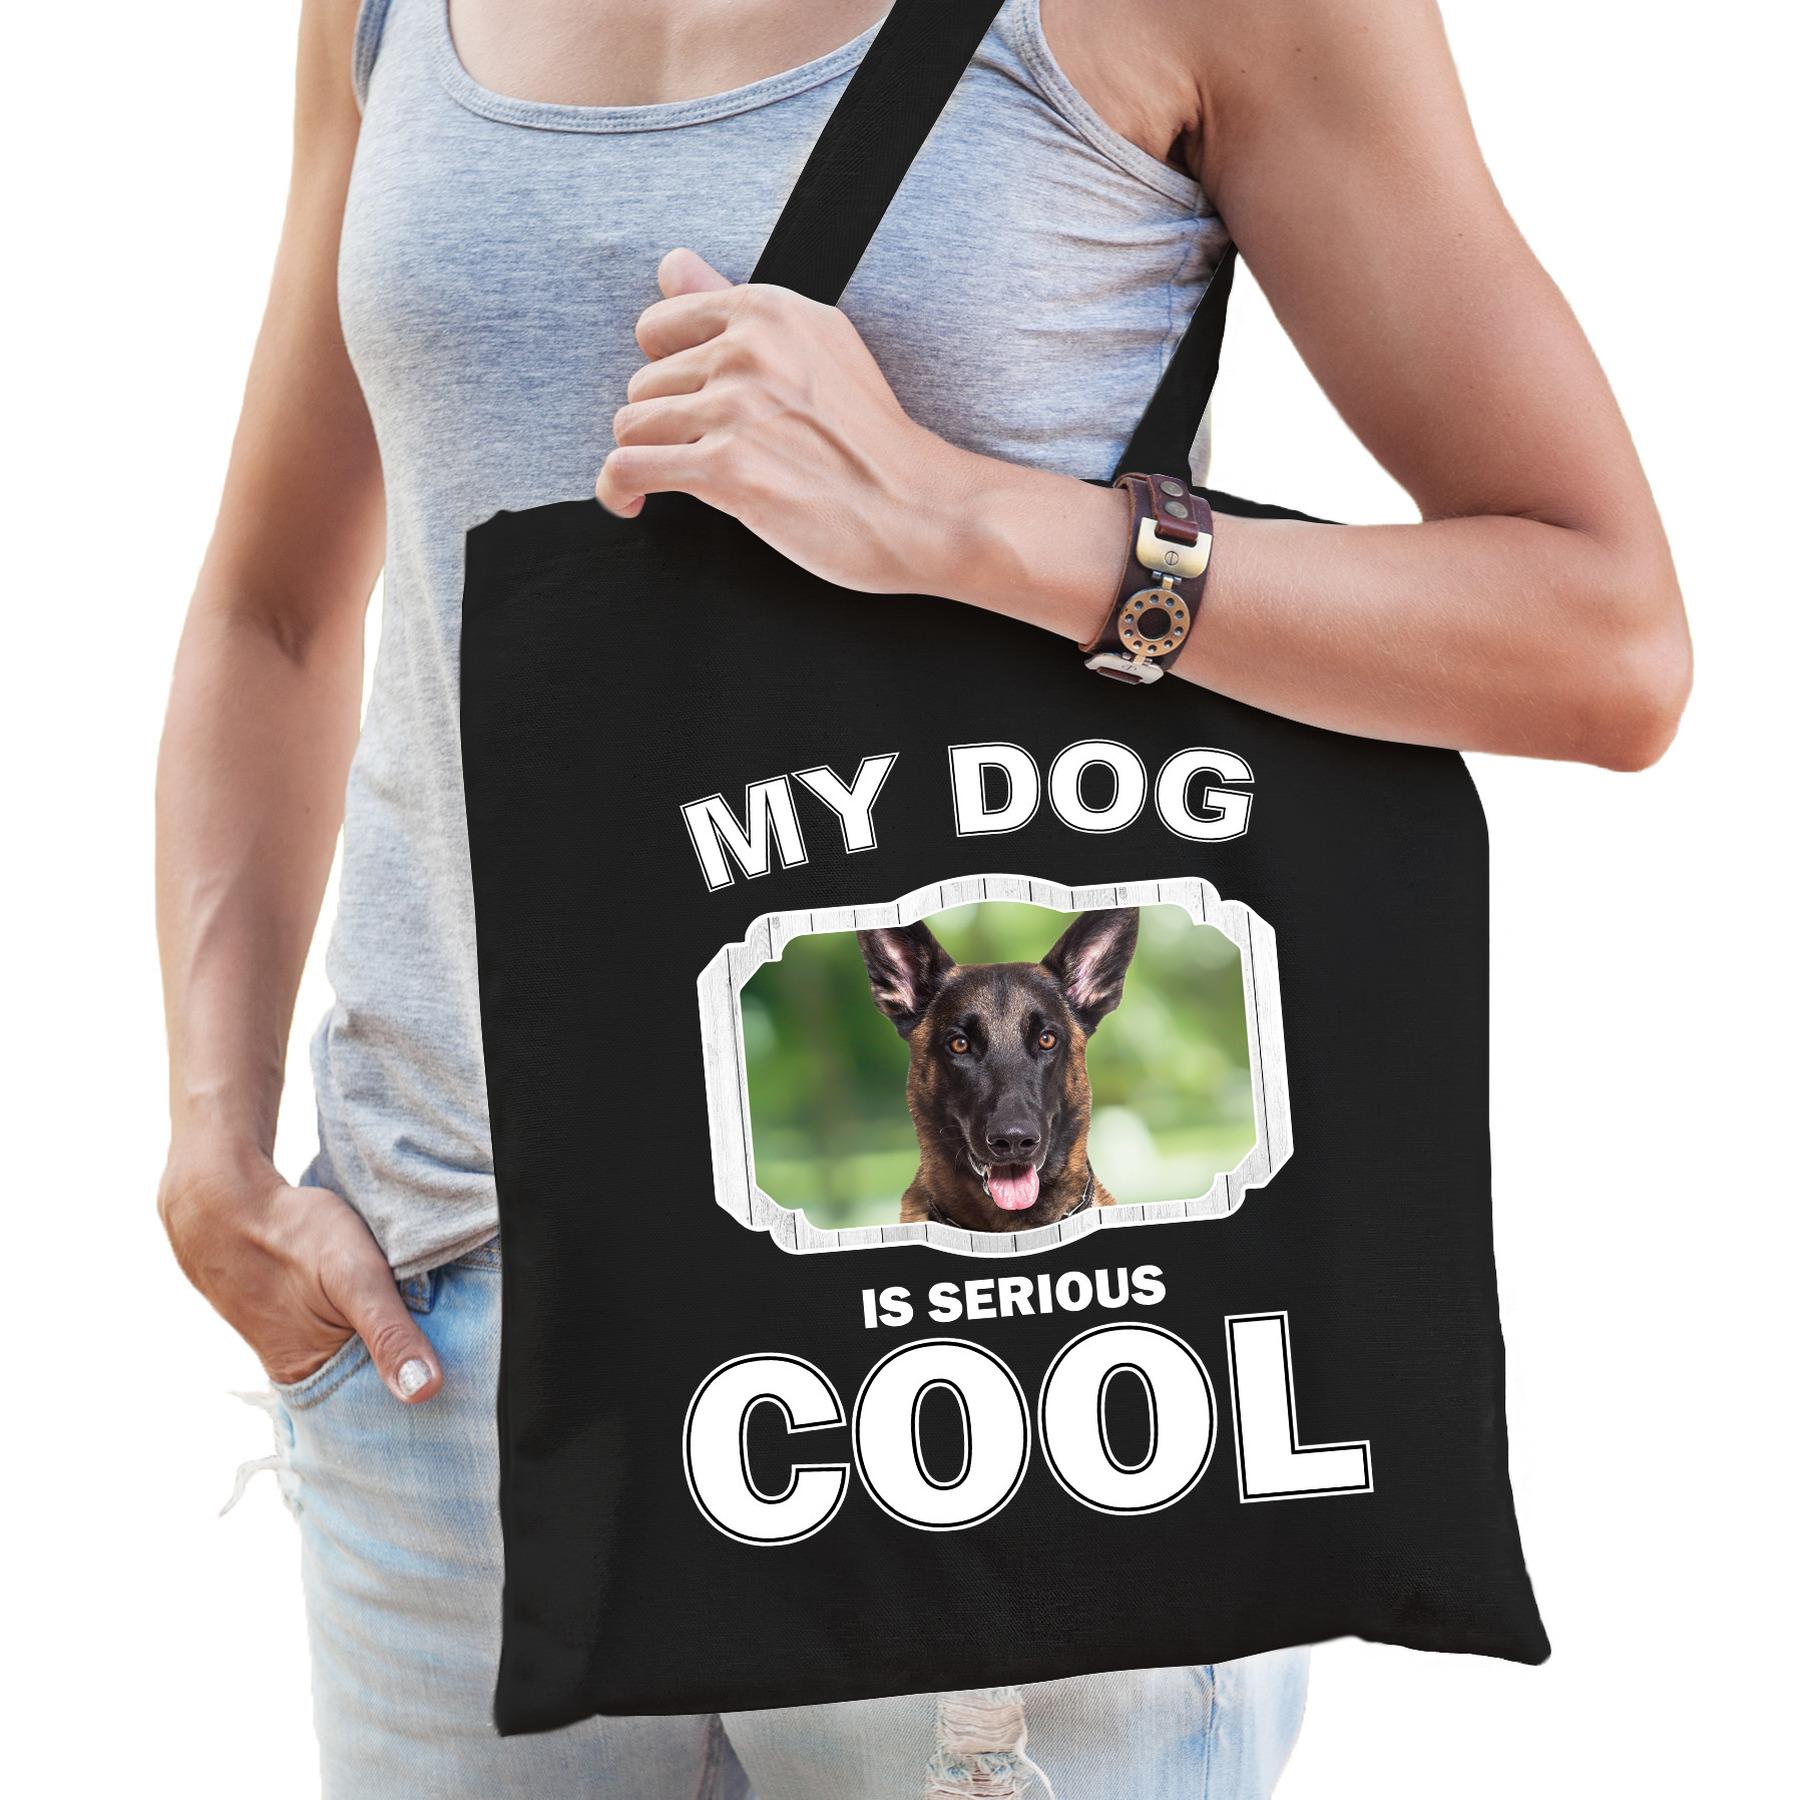 Katoenen tasje my dog is serious cool zwart - Mechelse herder honden cadeau tas